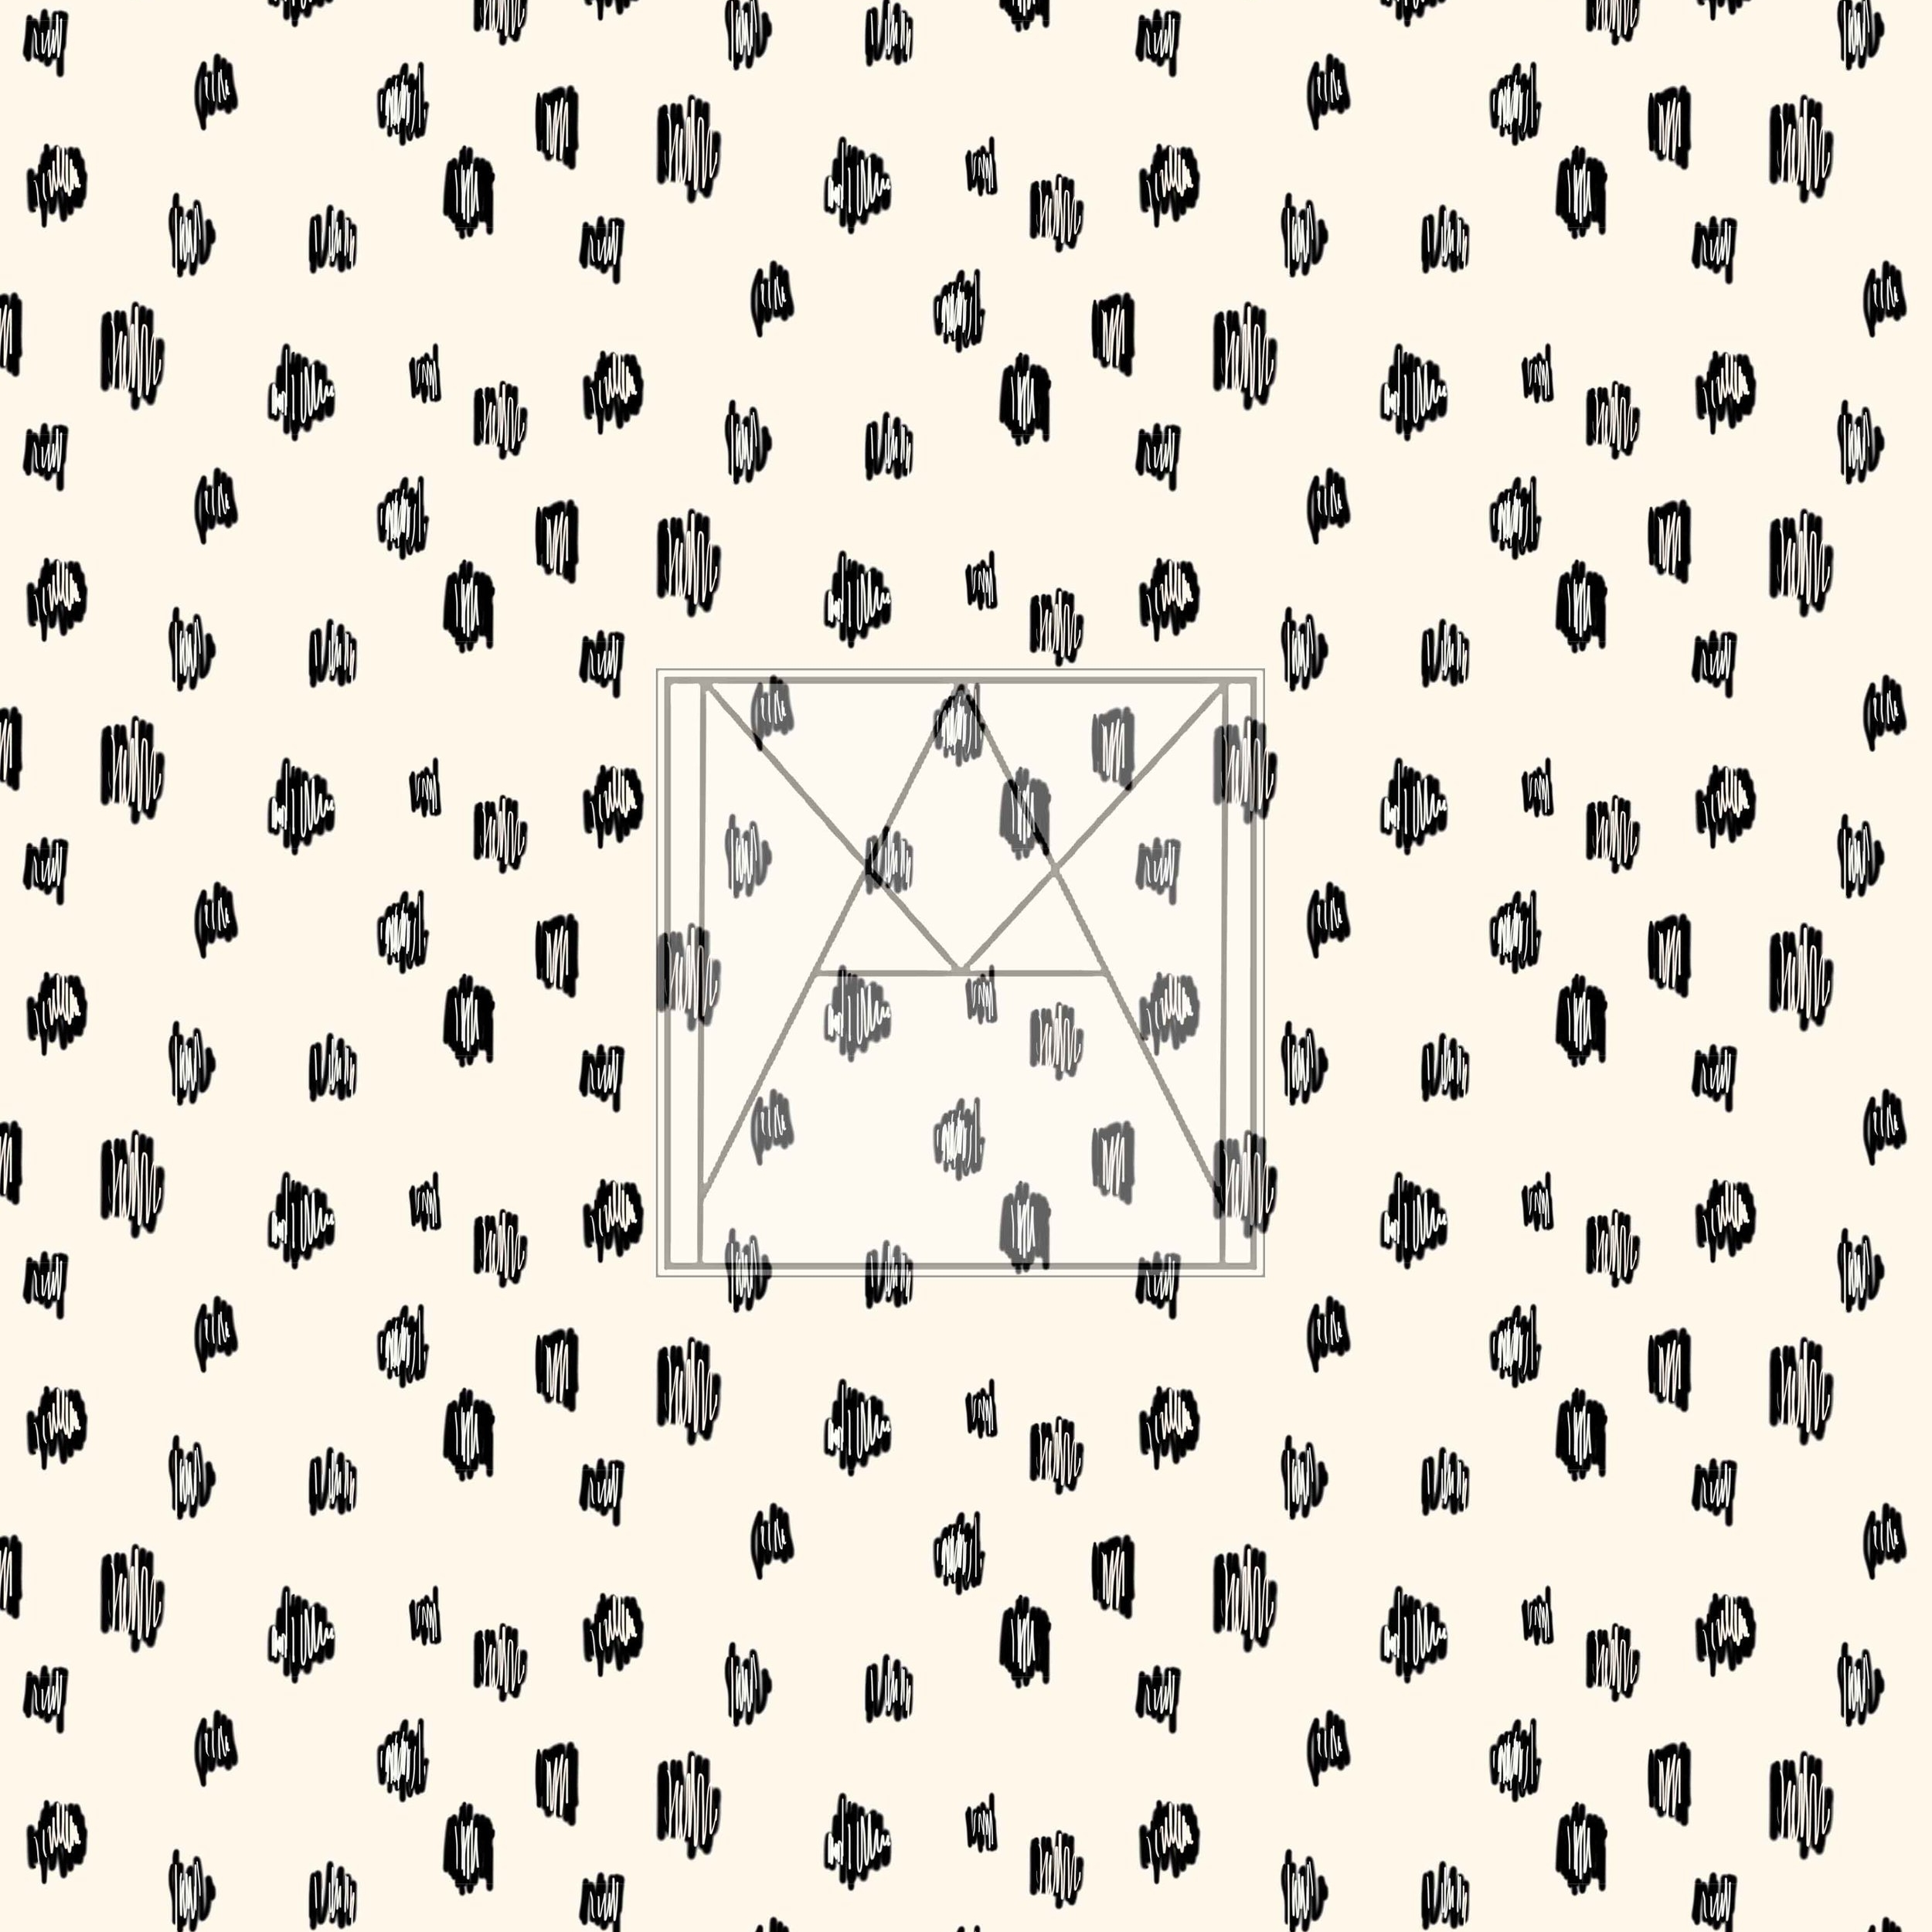 Non print 1 Cheetah spot marks (ak).jpg